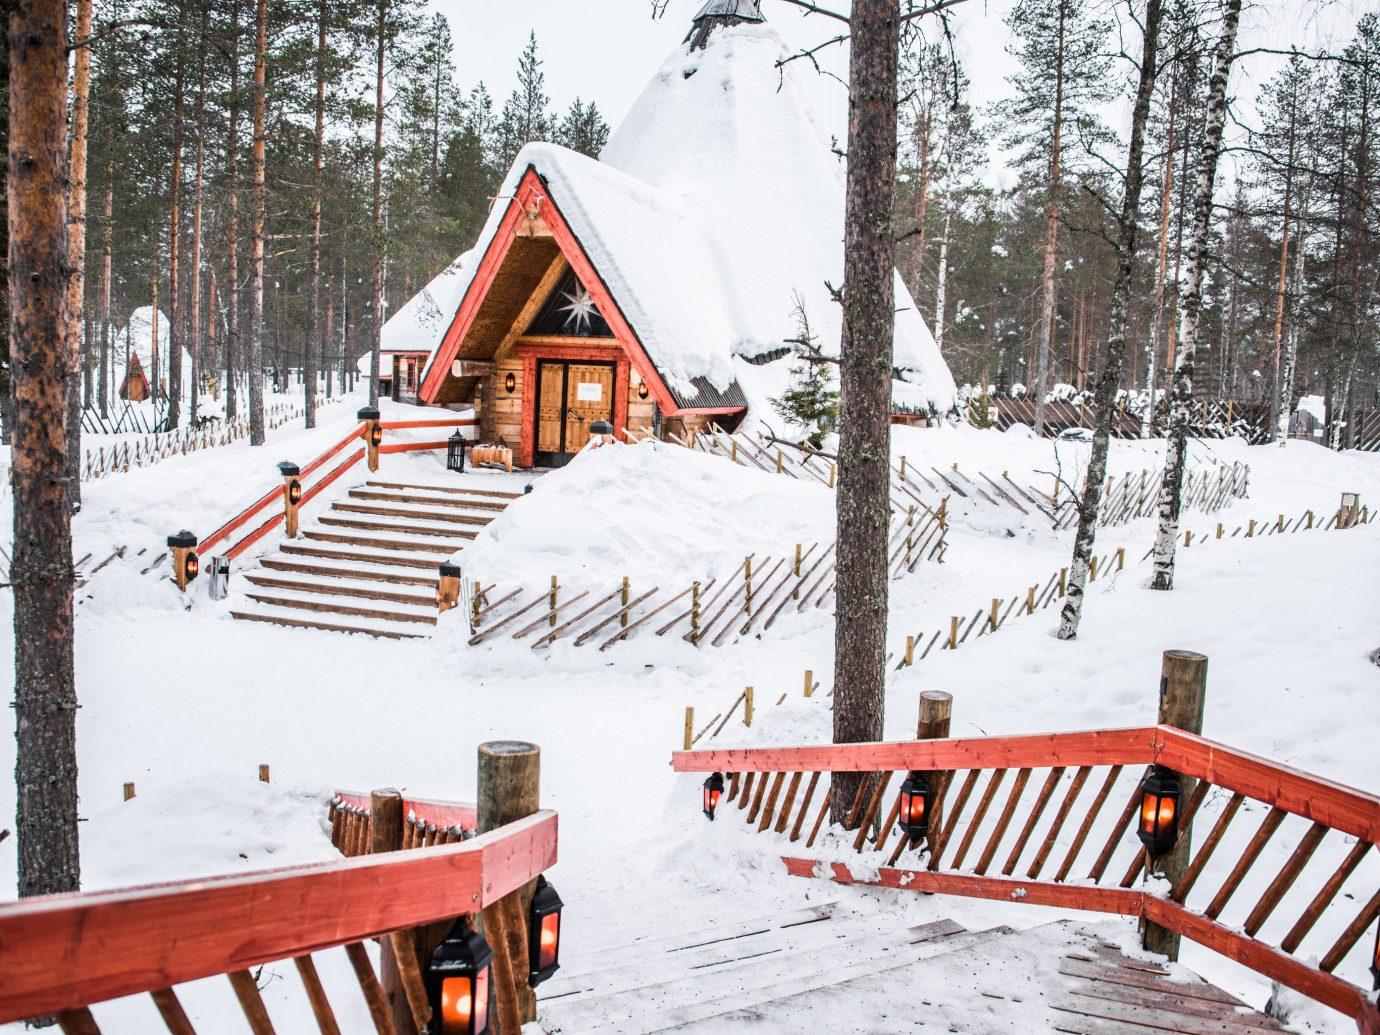 Rovanimeni, Finland